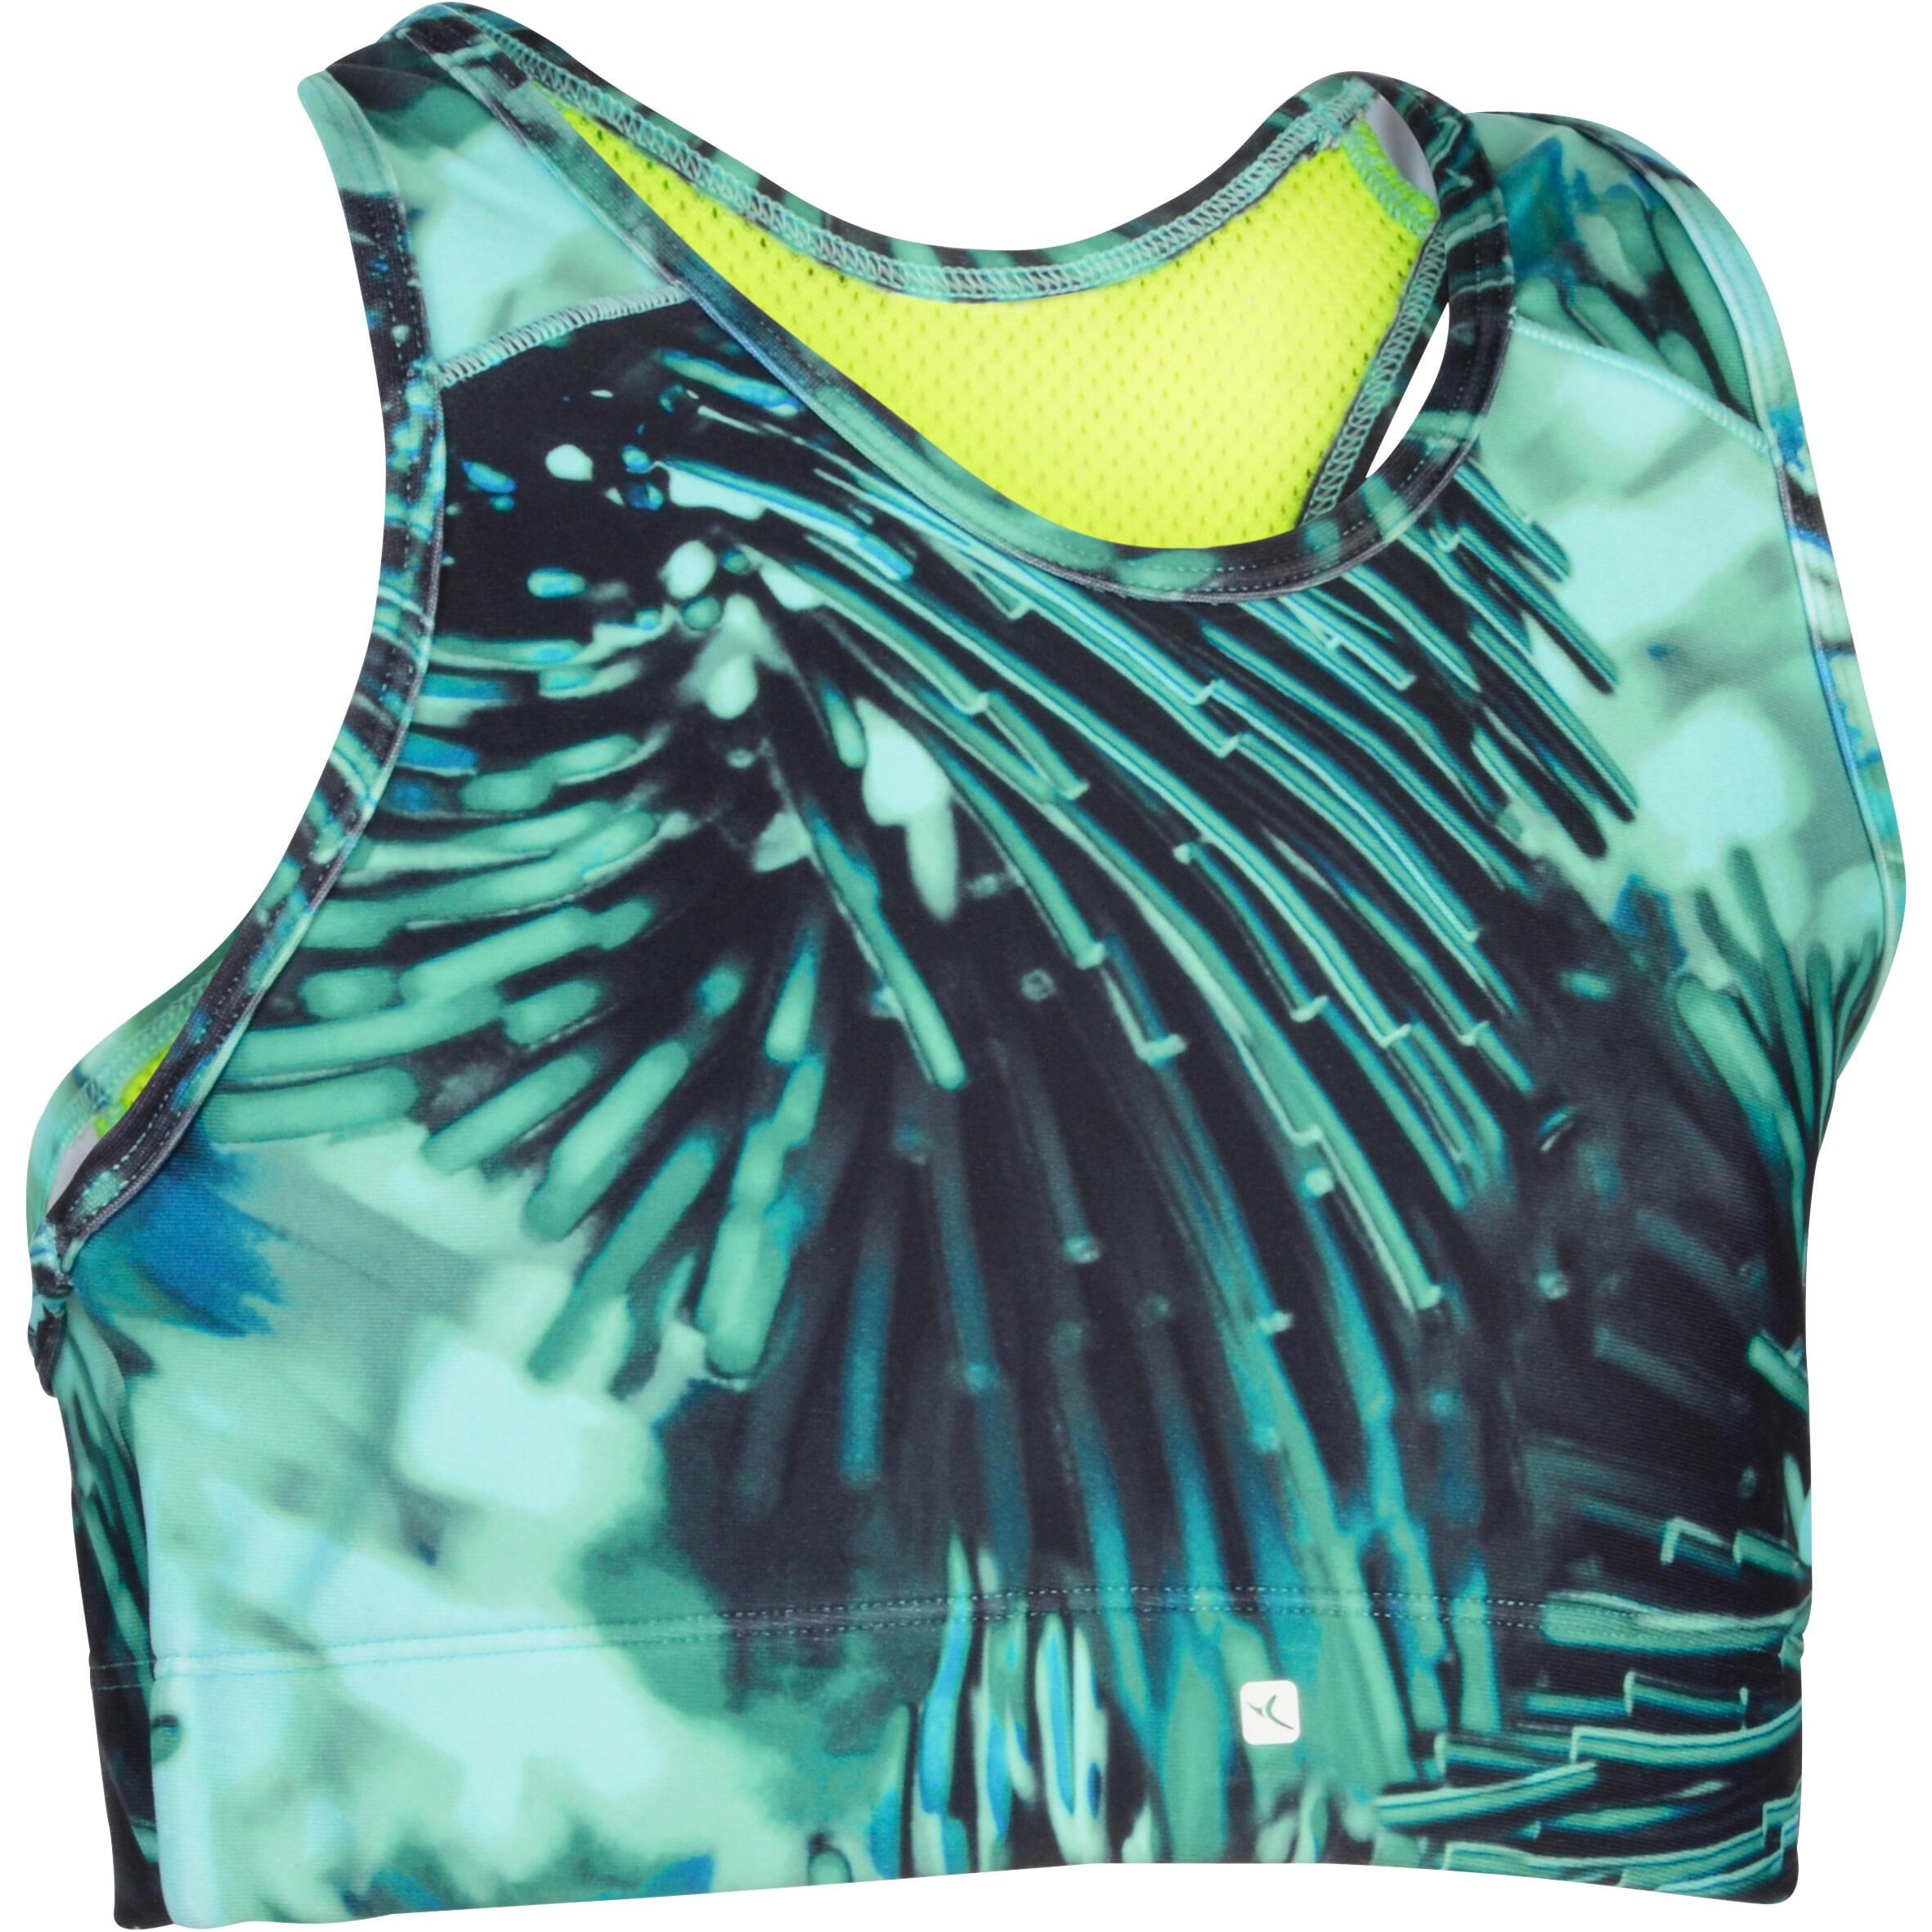 Brassiere-top 960 gimnasia niña estampado azul verde